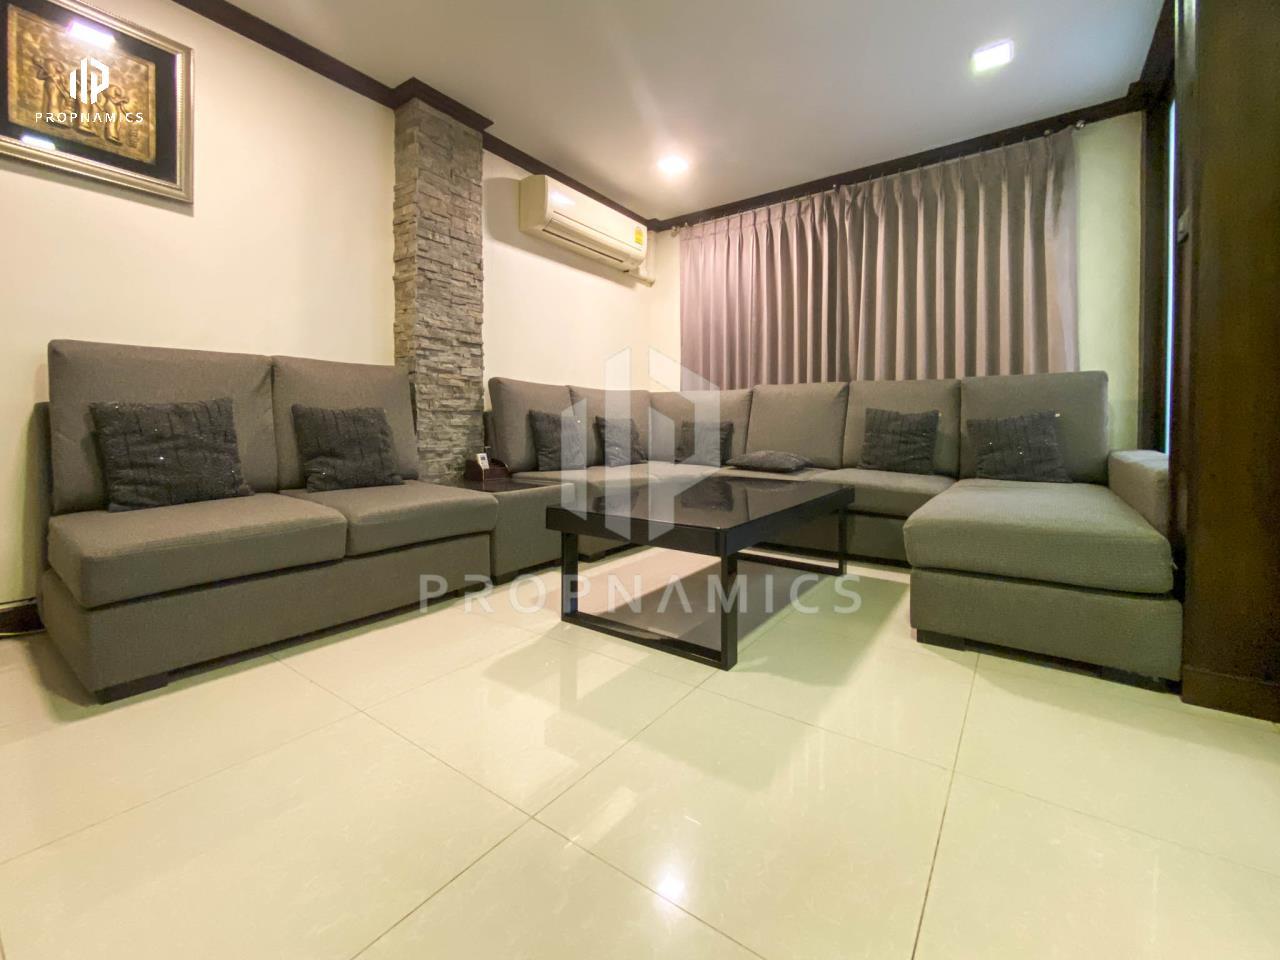 Propnamics Co., Ltd Agency's FOR RENT: SINGLE HOUSE IN SUKHUMVIT 26 4